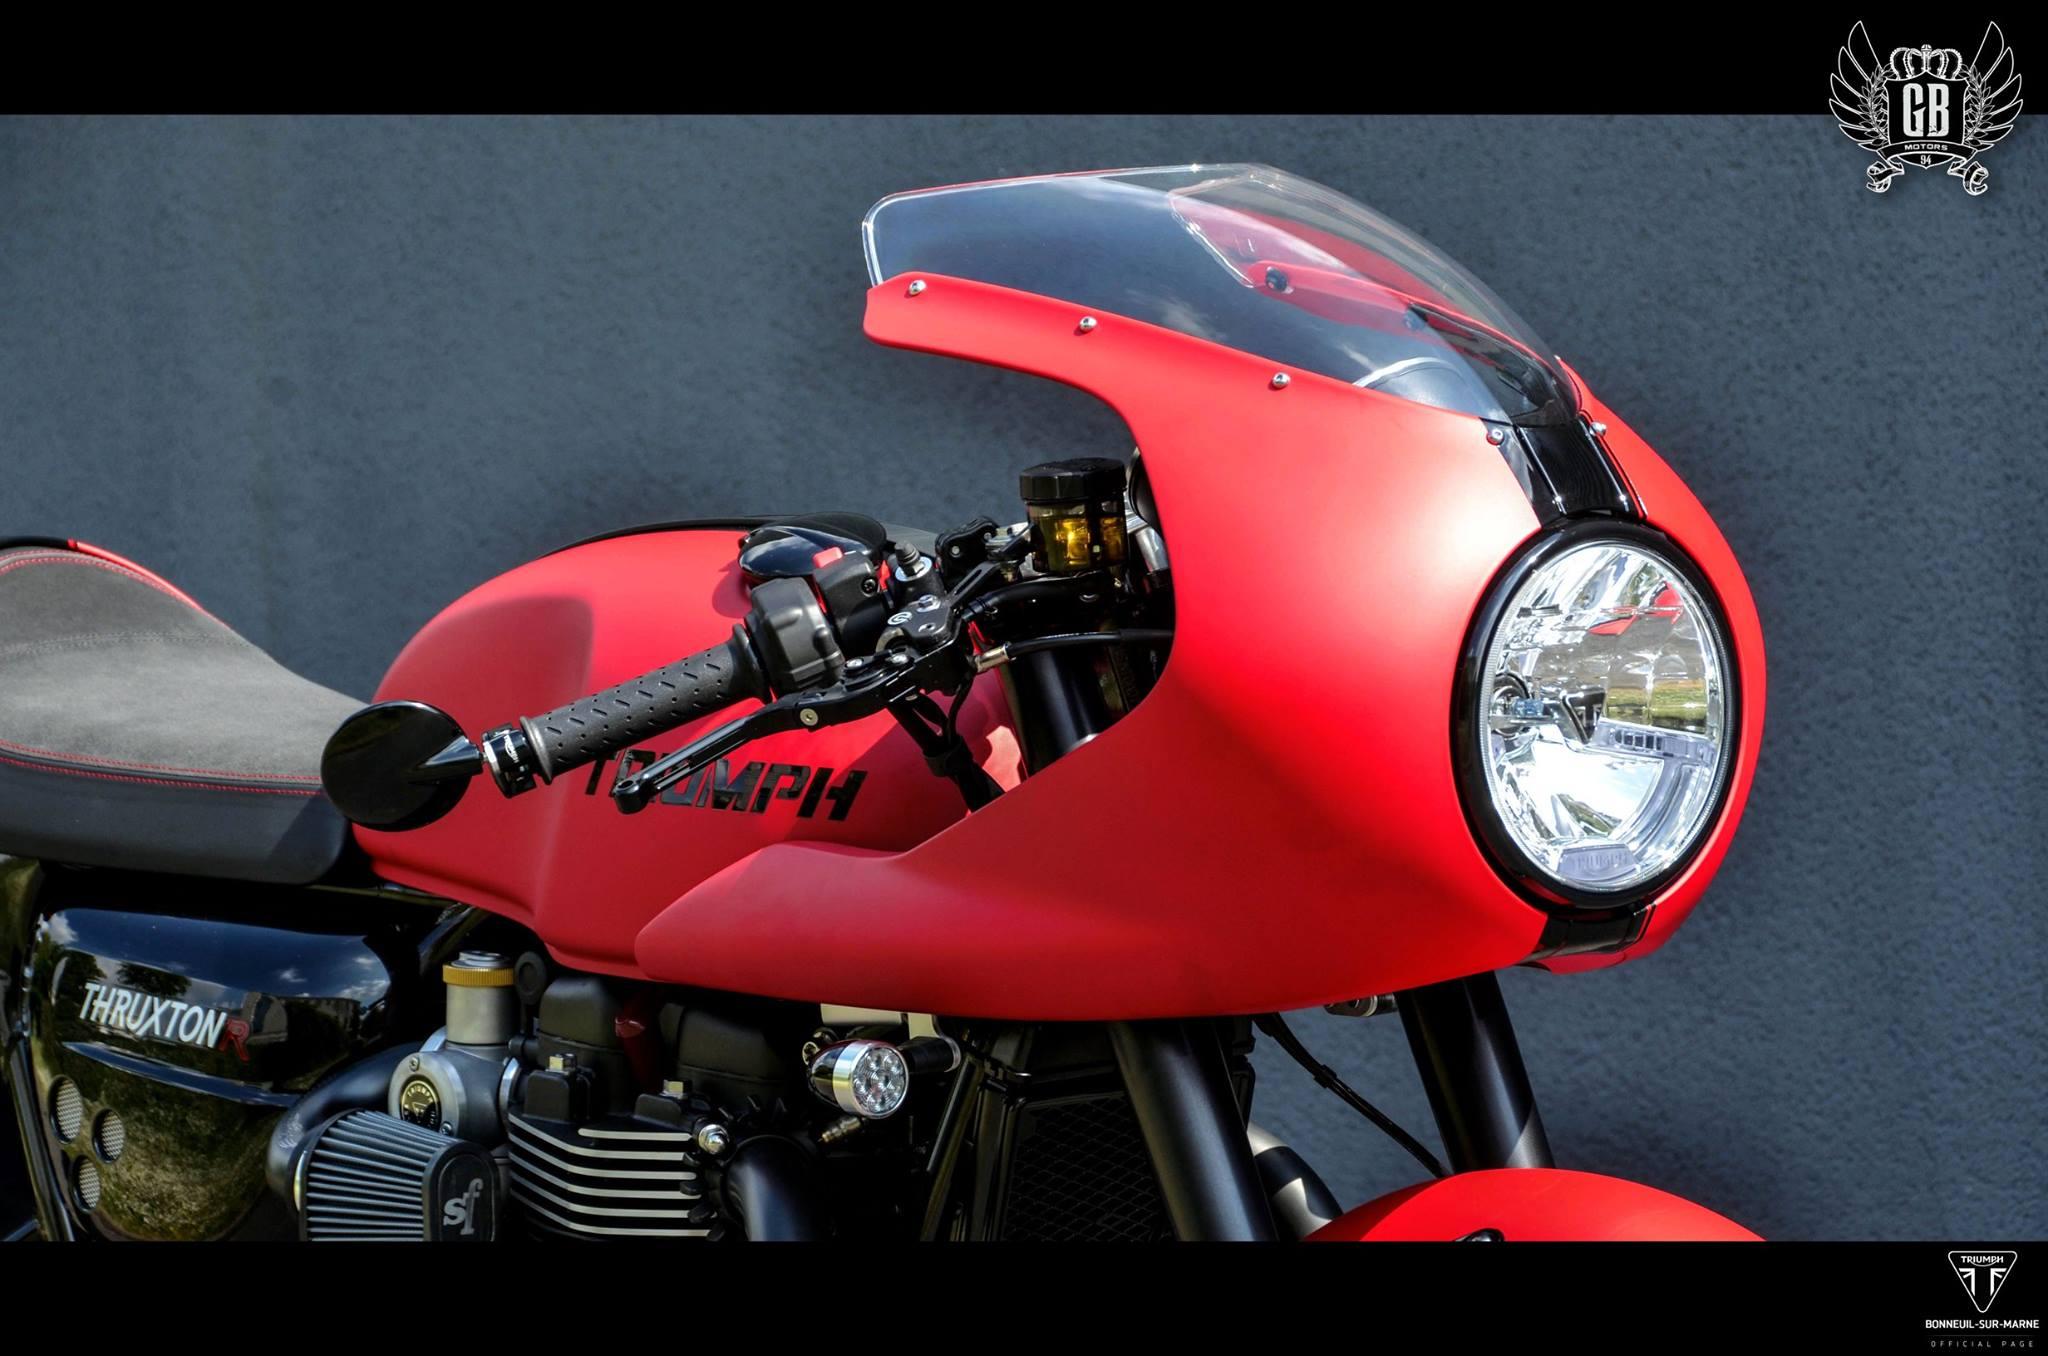 Triumph GB Motors 94 6